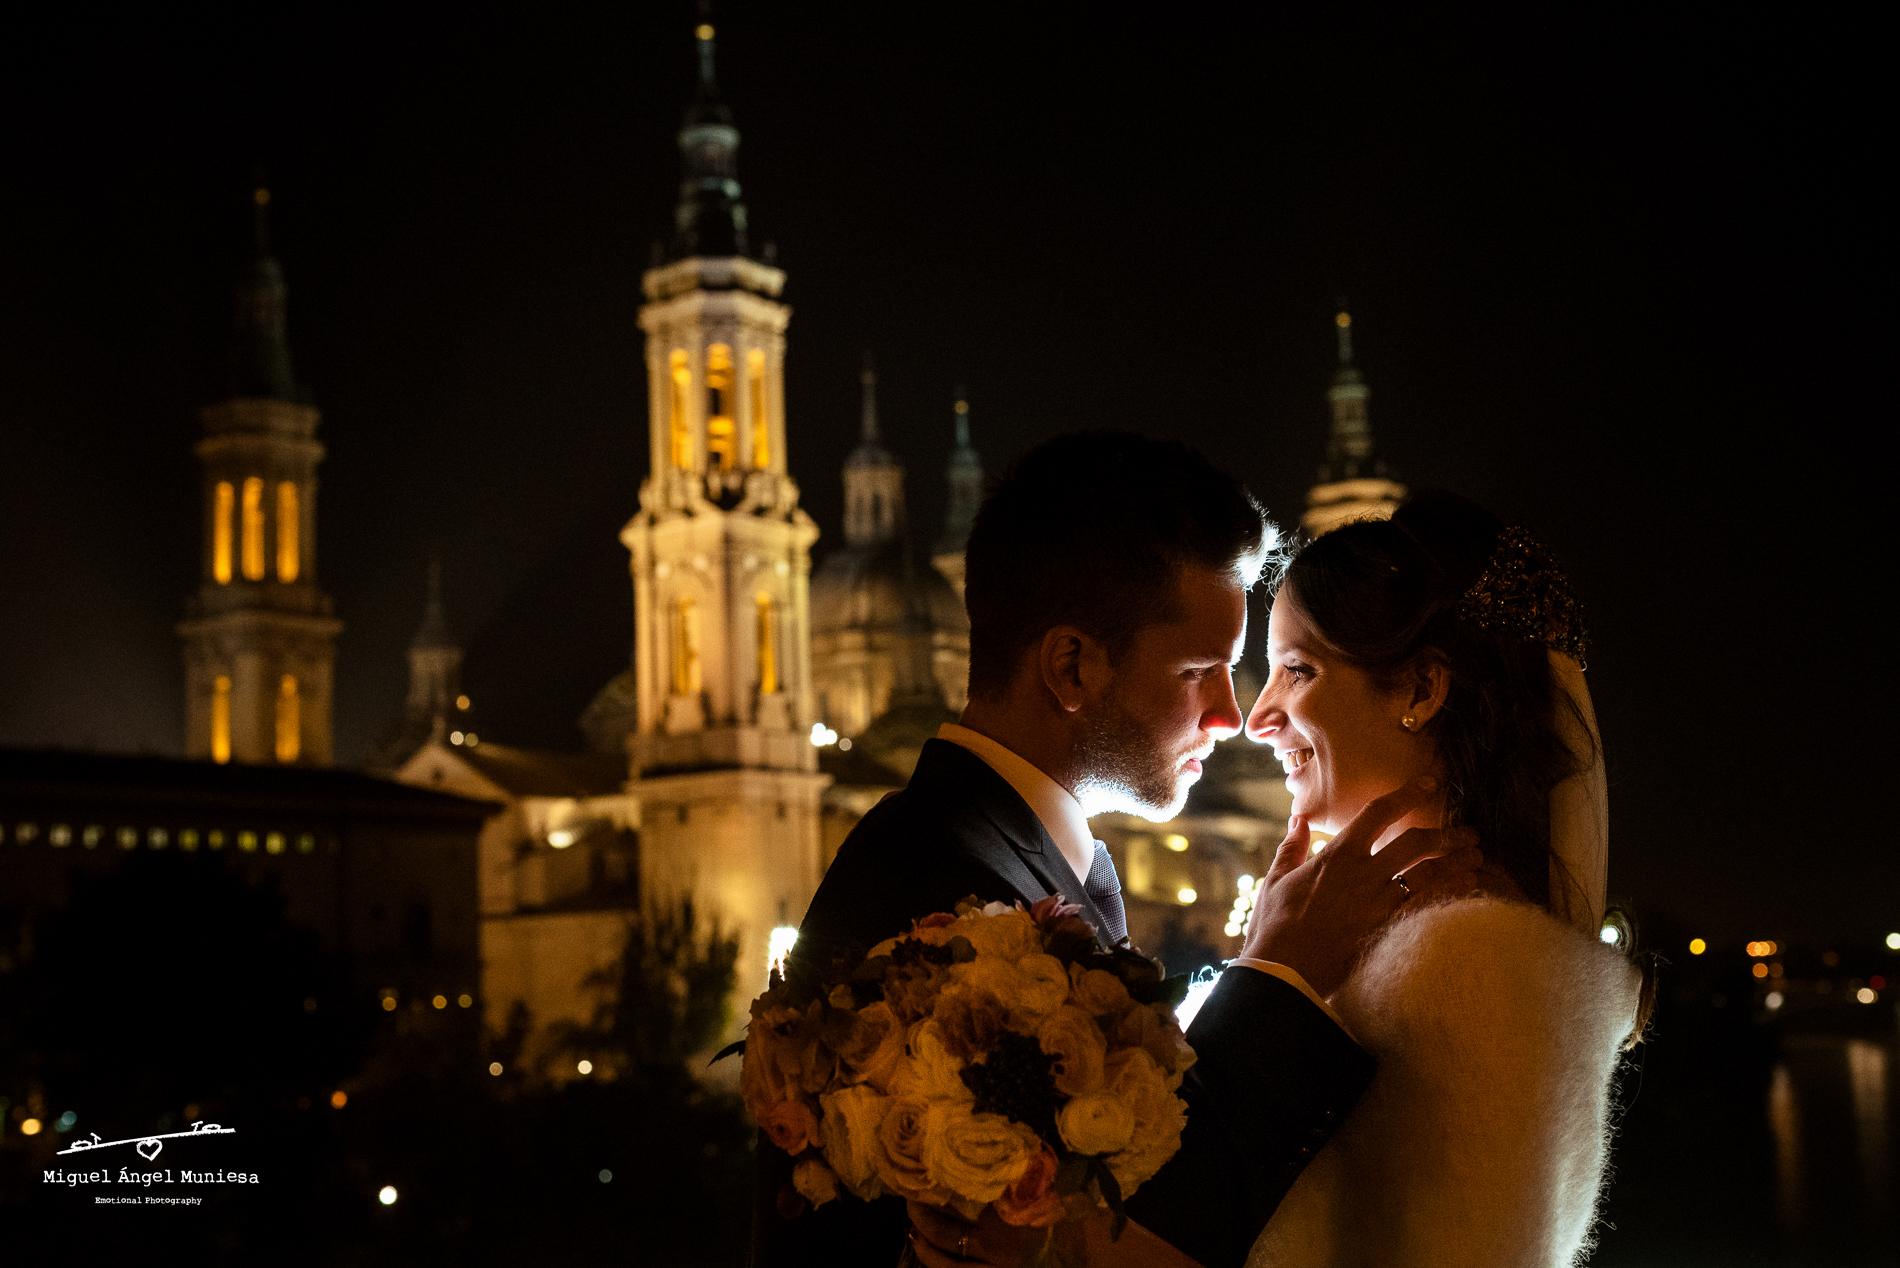 miguel angel muniesa, fotografo boda Teruel, fotografo boda navarra, fotografo boda zaragoza, fotografo boda soria, miguel angel muniesa emotional photography_28